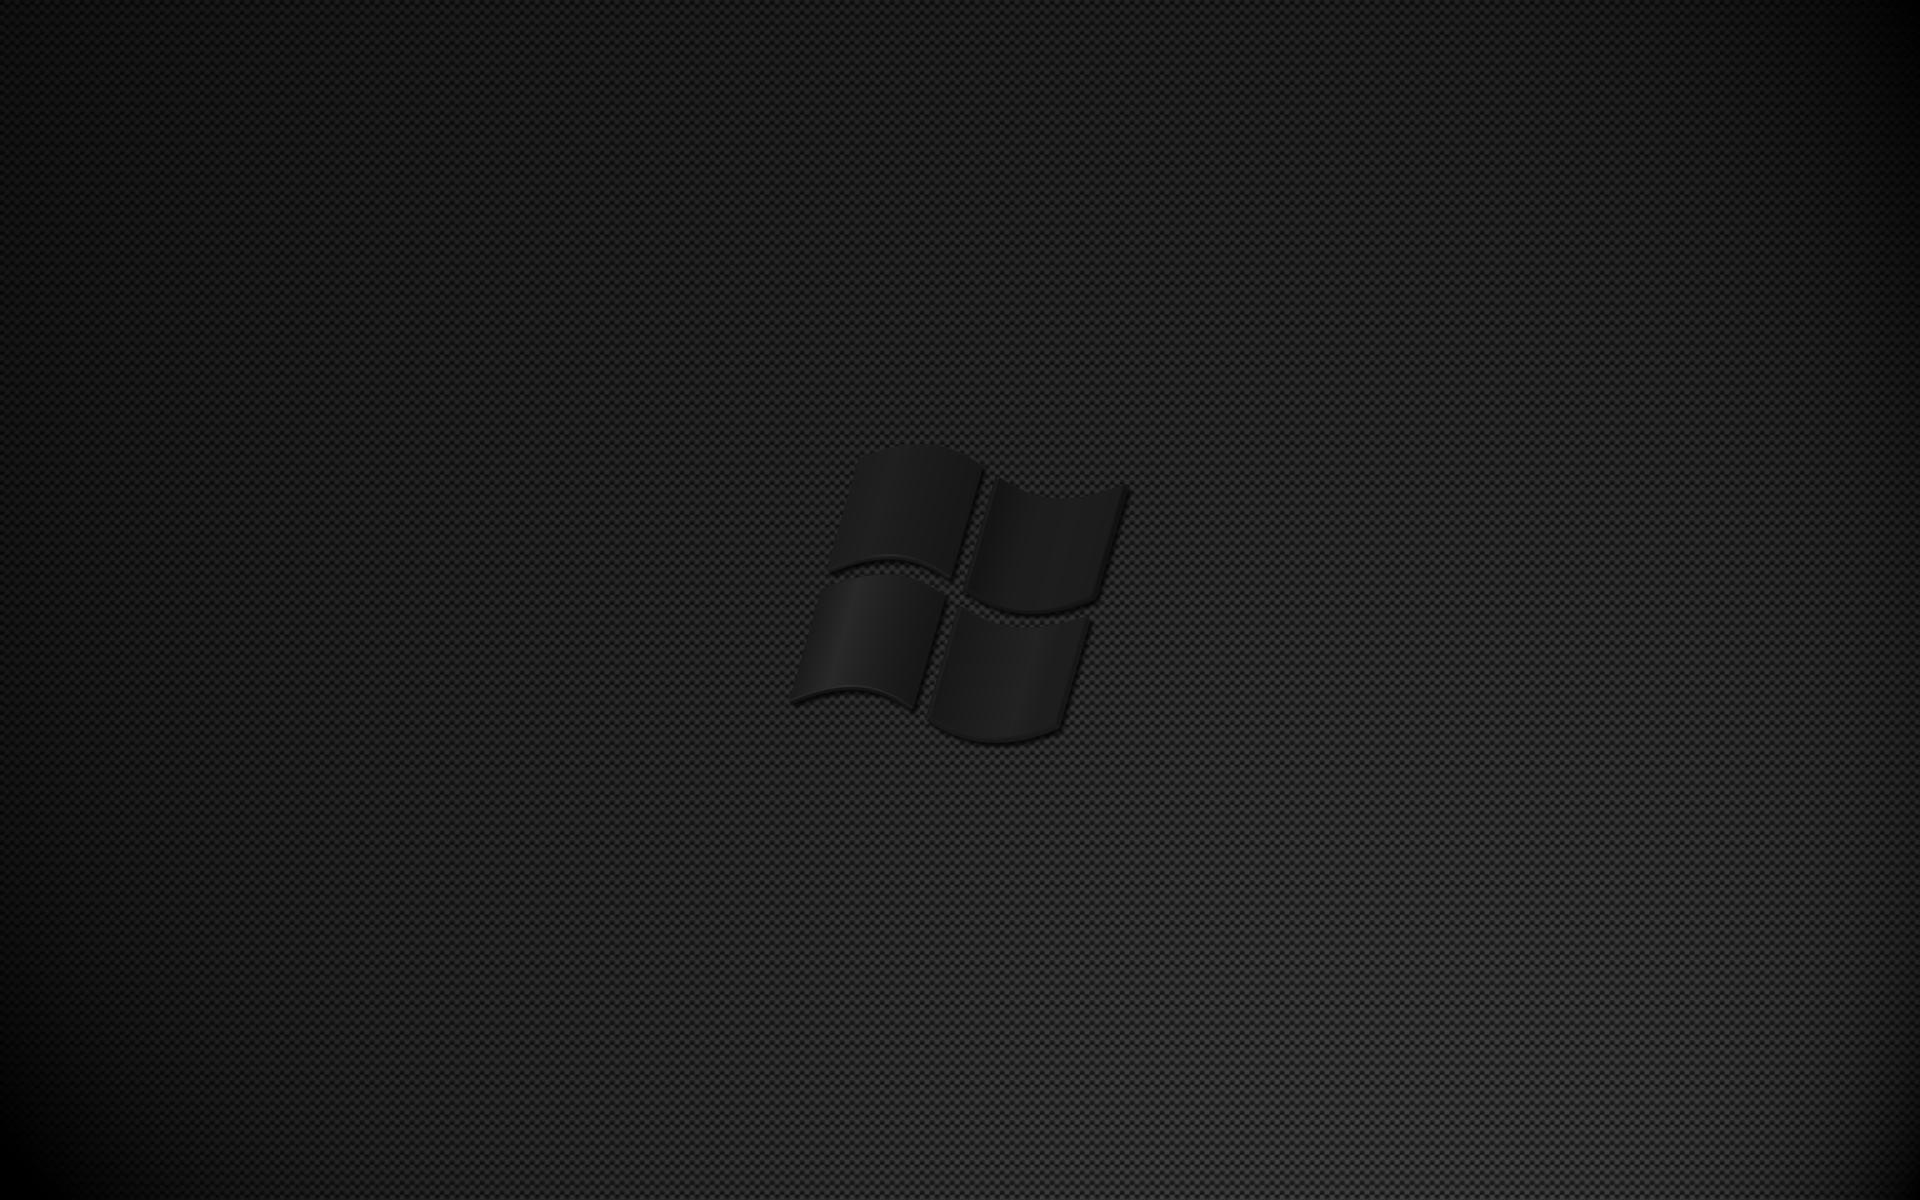 60 Dark Windows 7 Wallpaper On Wallpapersafari